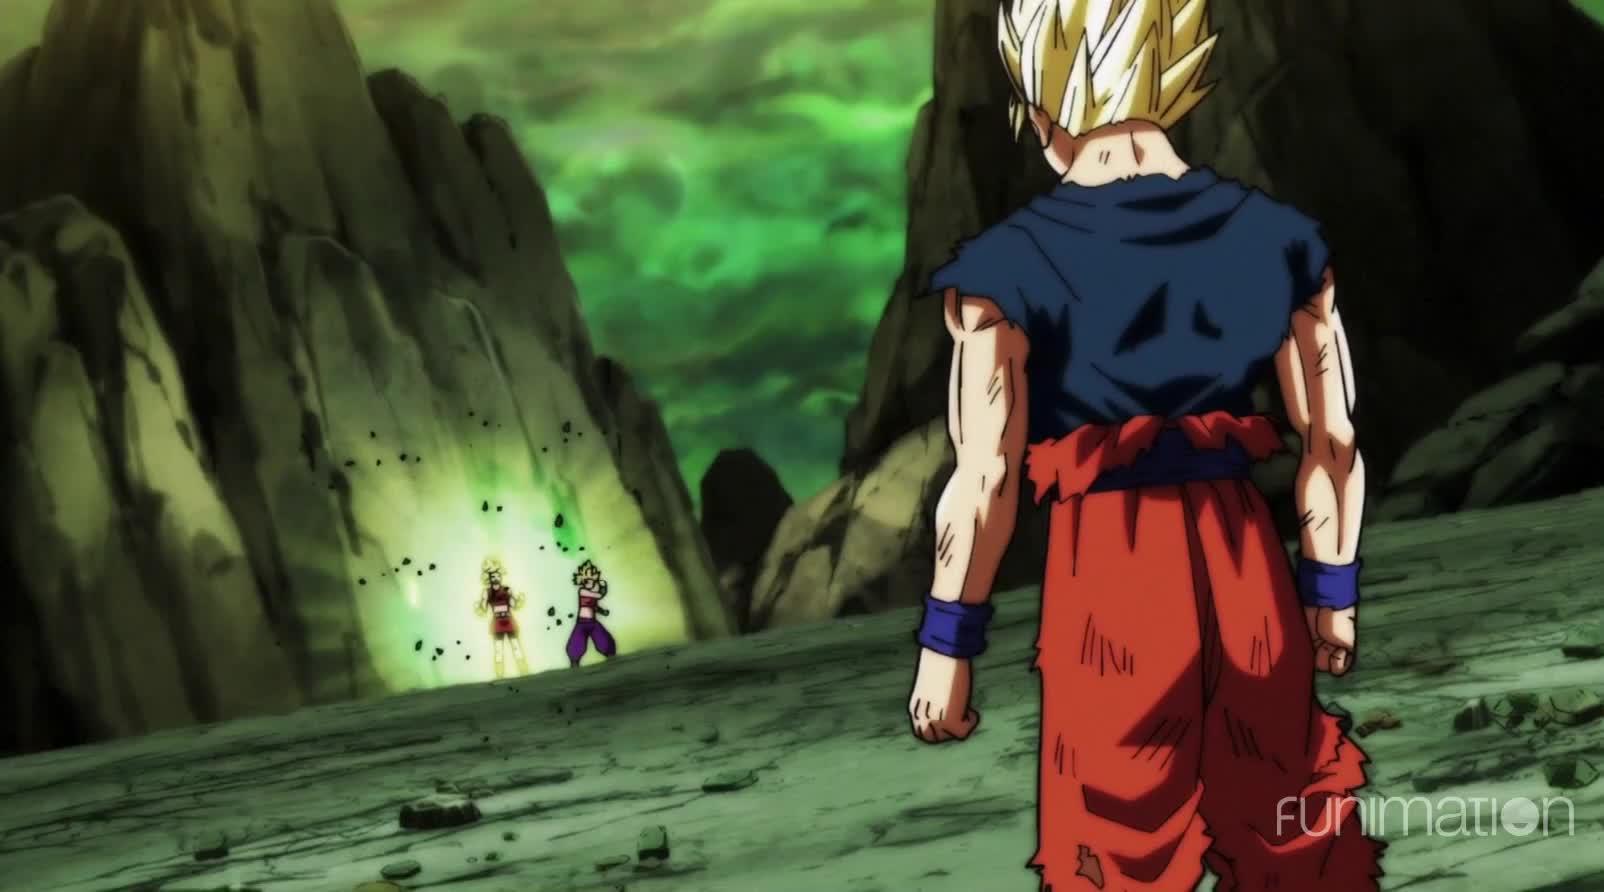 Dragon Ball Super, Dragonballsuper, Episode 113, anime, dragonballz, funimation, Kale's going berserk Saiyan! GIFs